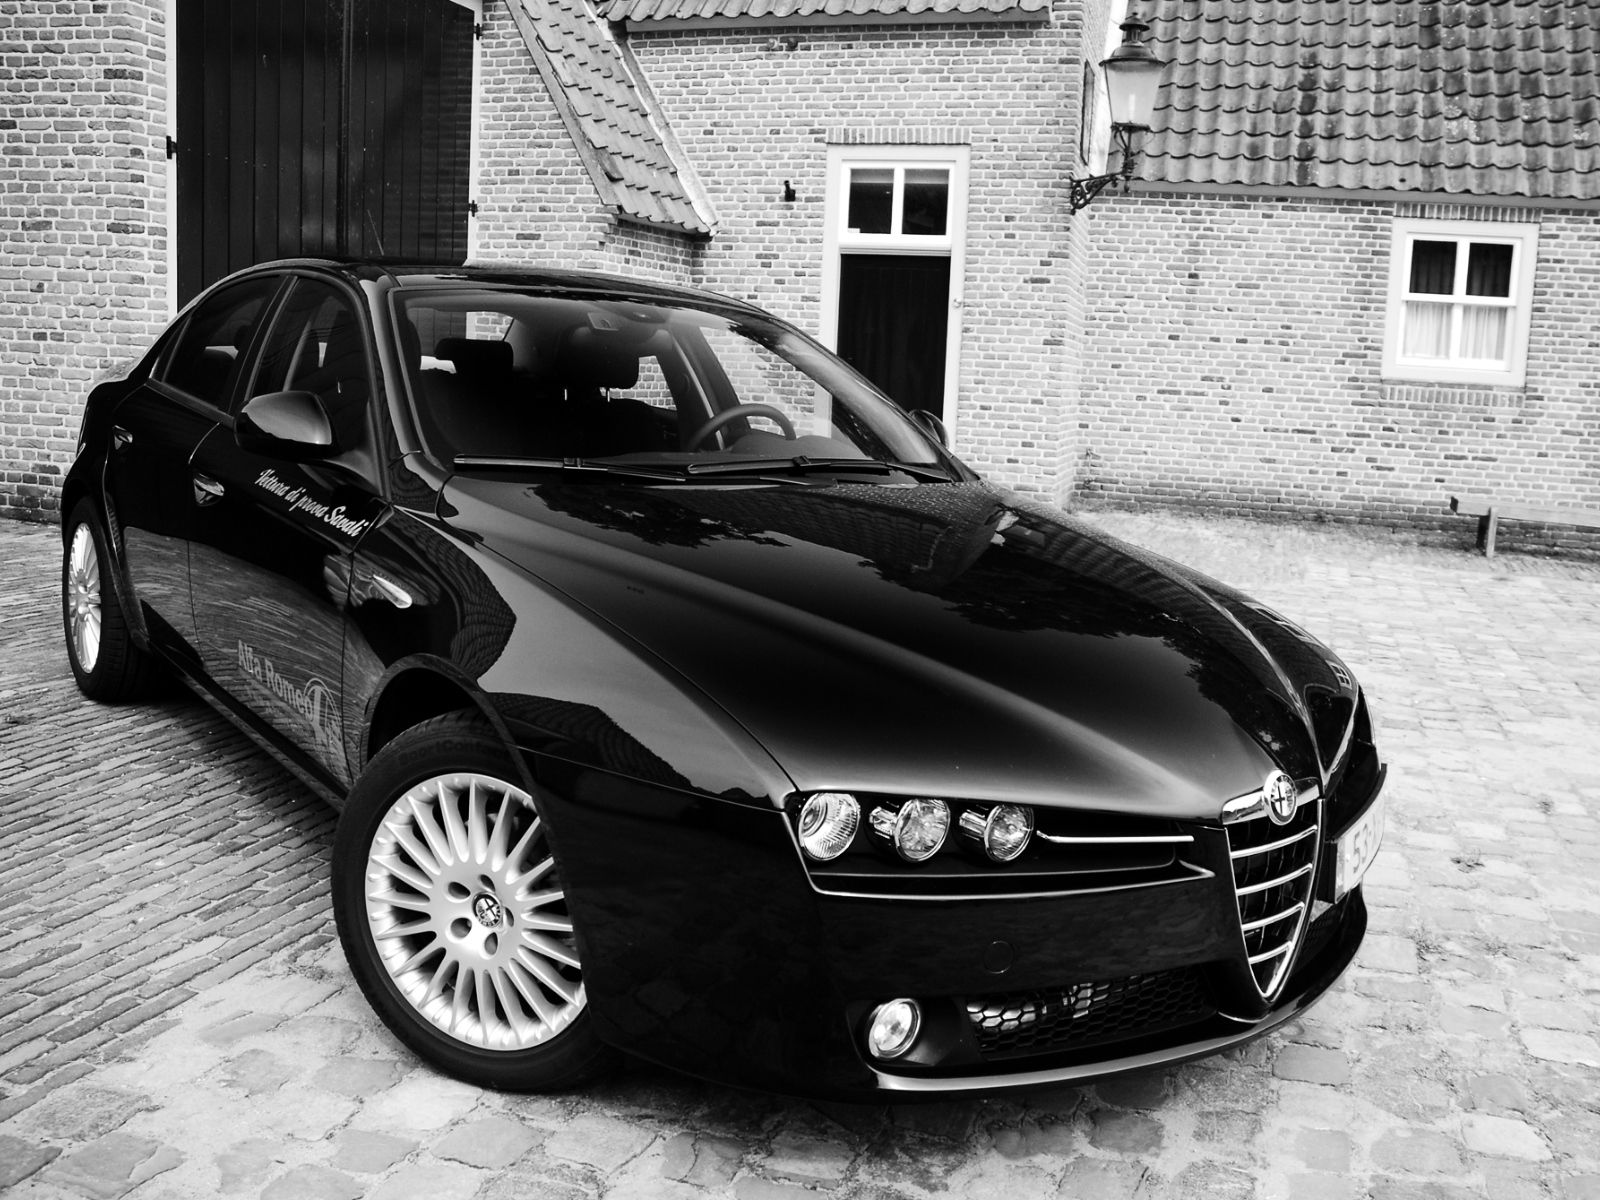 Alfa Romeo 159 Image In 2020 Alfa Romeo Sports Car Wallpaper